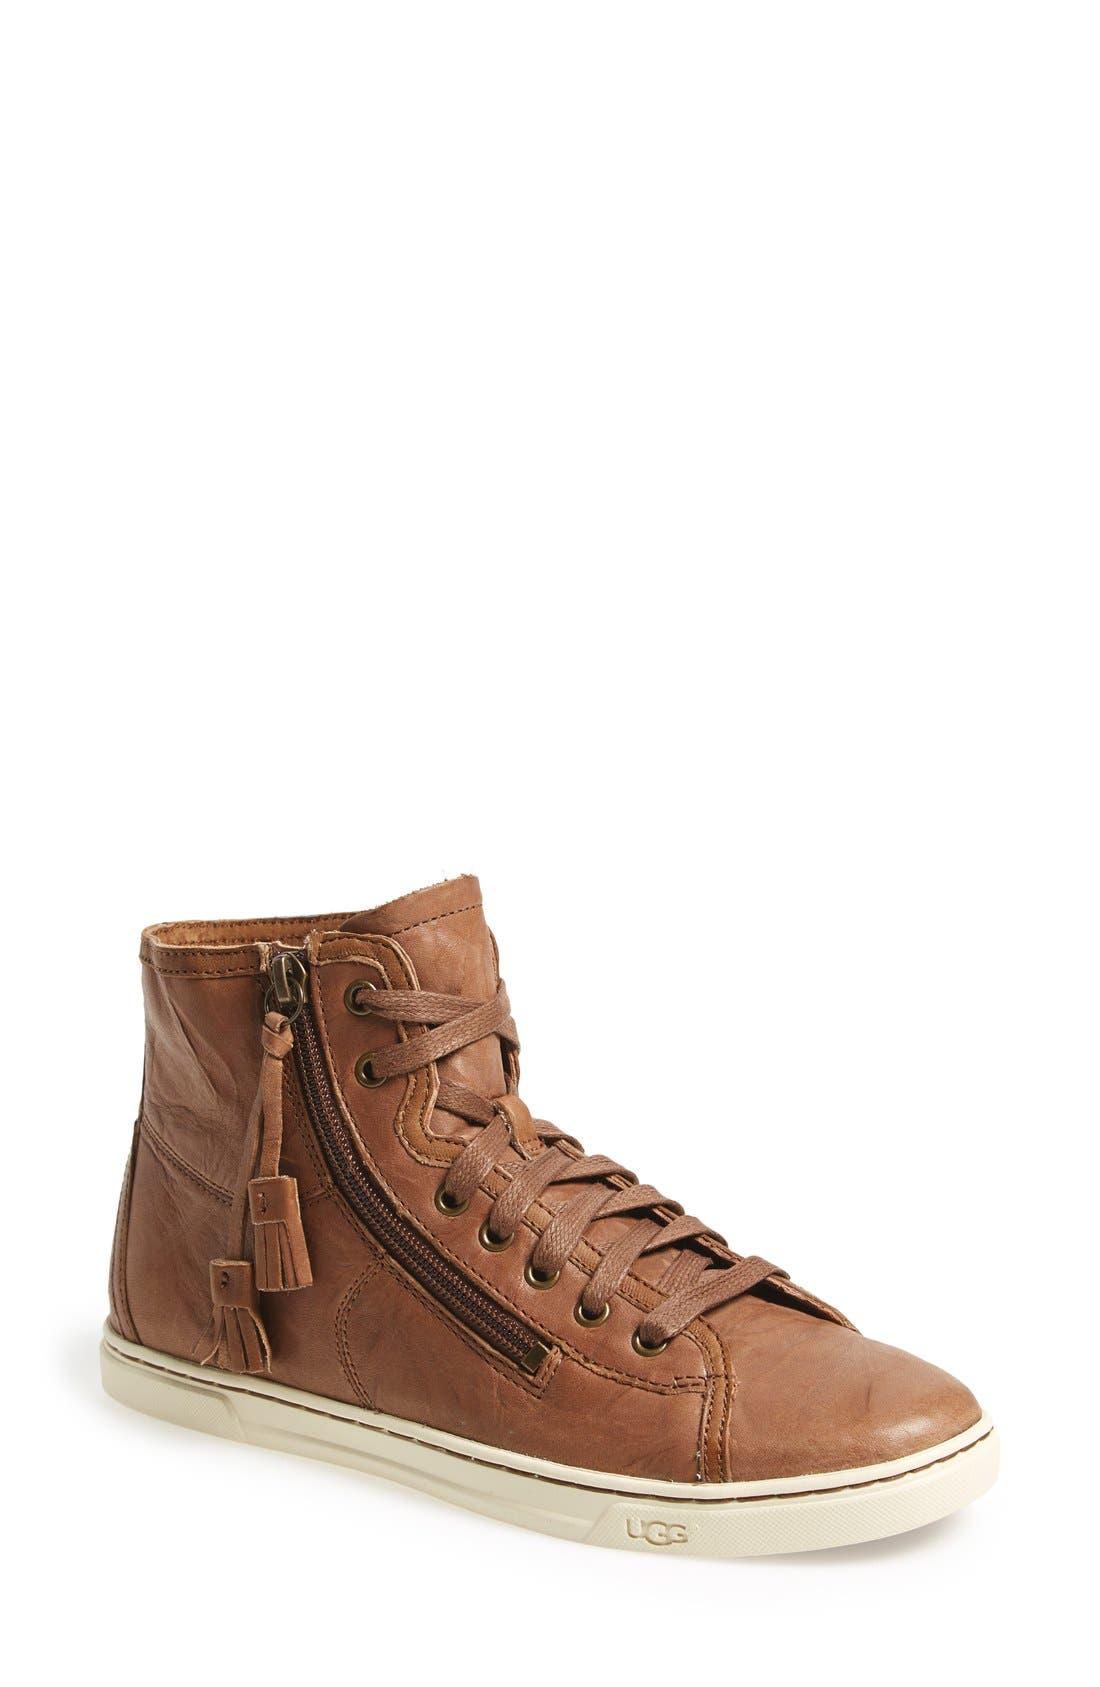 Main Image - UGG® 'Blaney' Tasseled High Top Sneaker (Women)